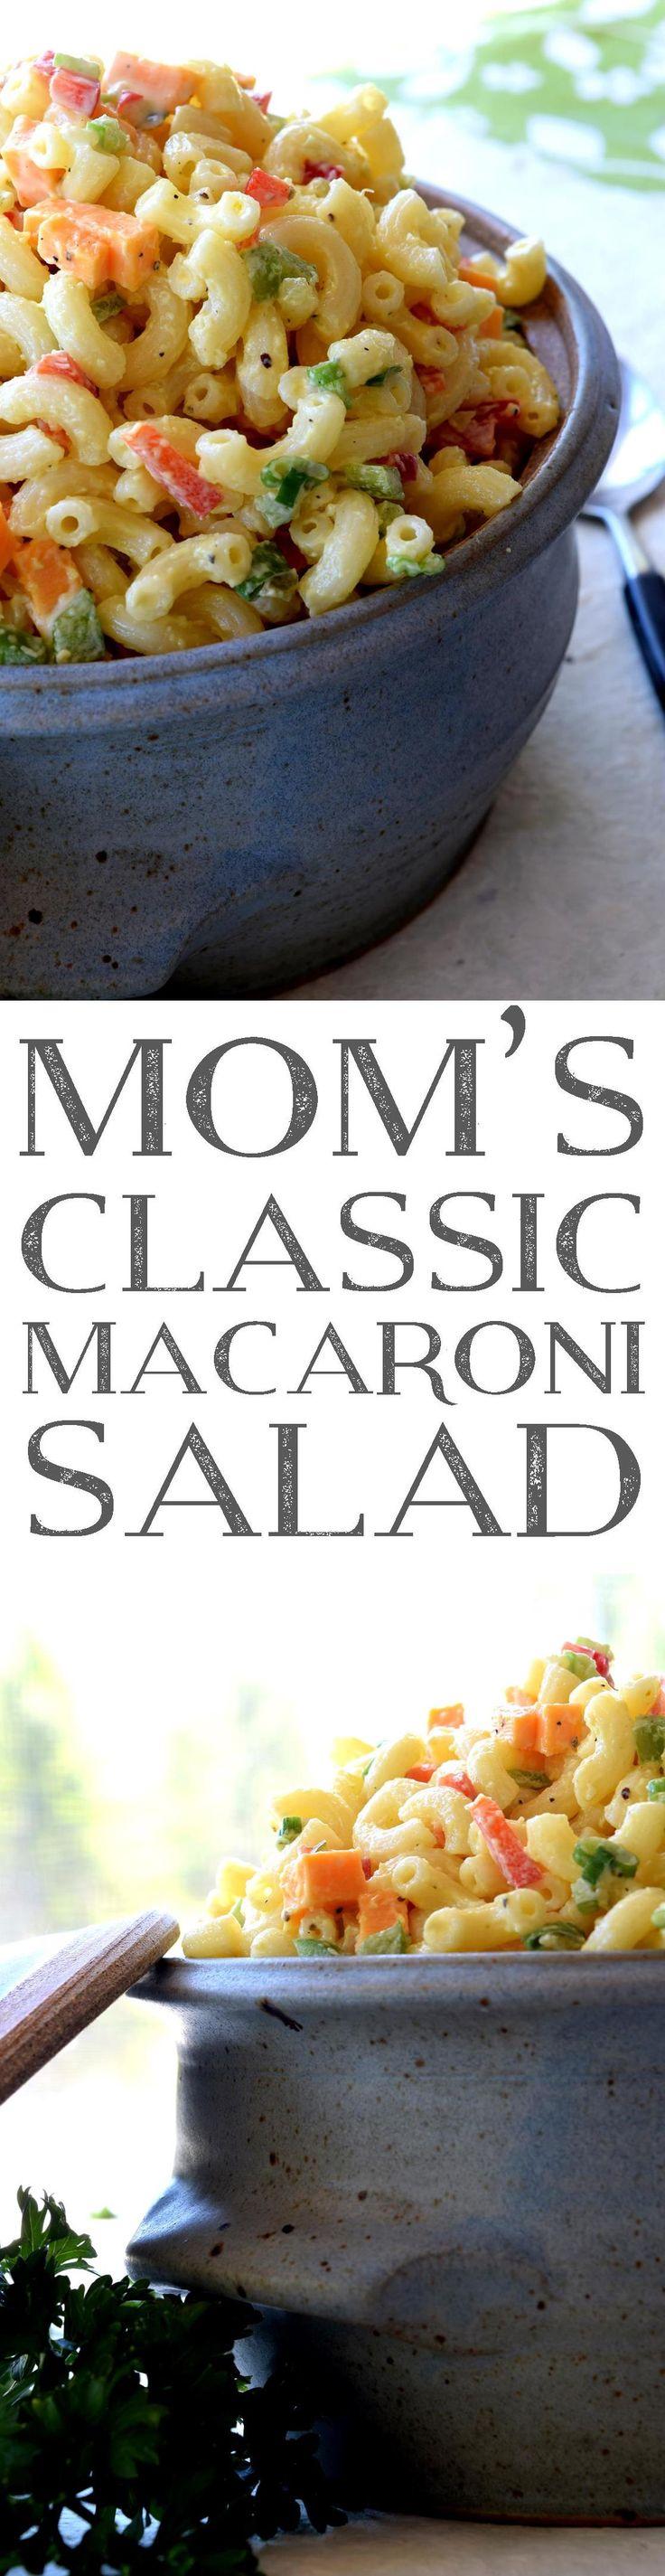 Mom's Classic Macaroni Salad